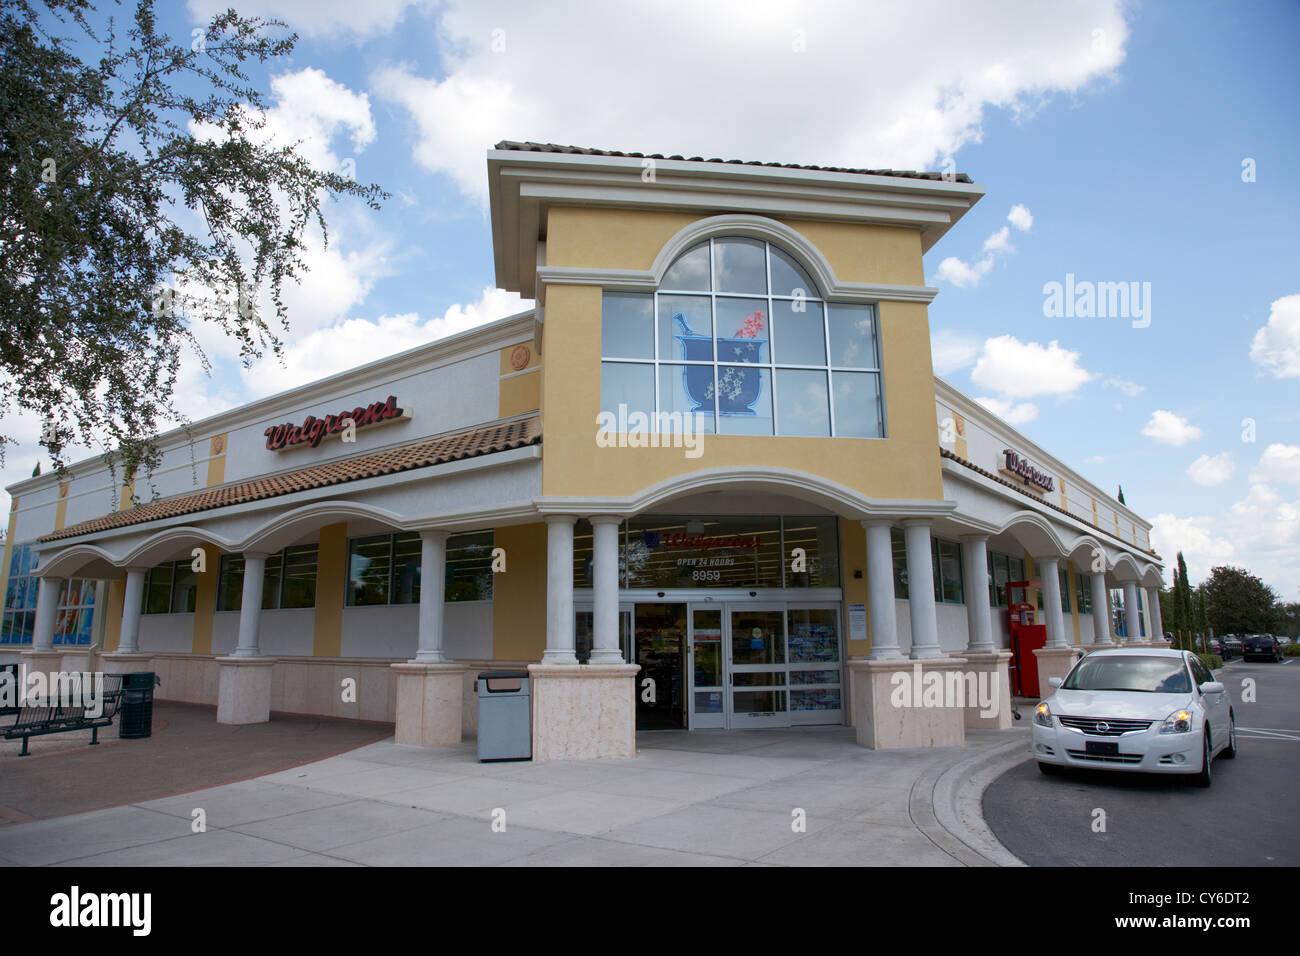 walgreens drug store orlando florida usa - Stock Image